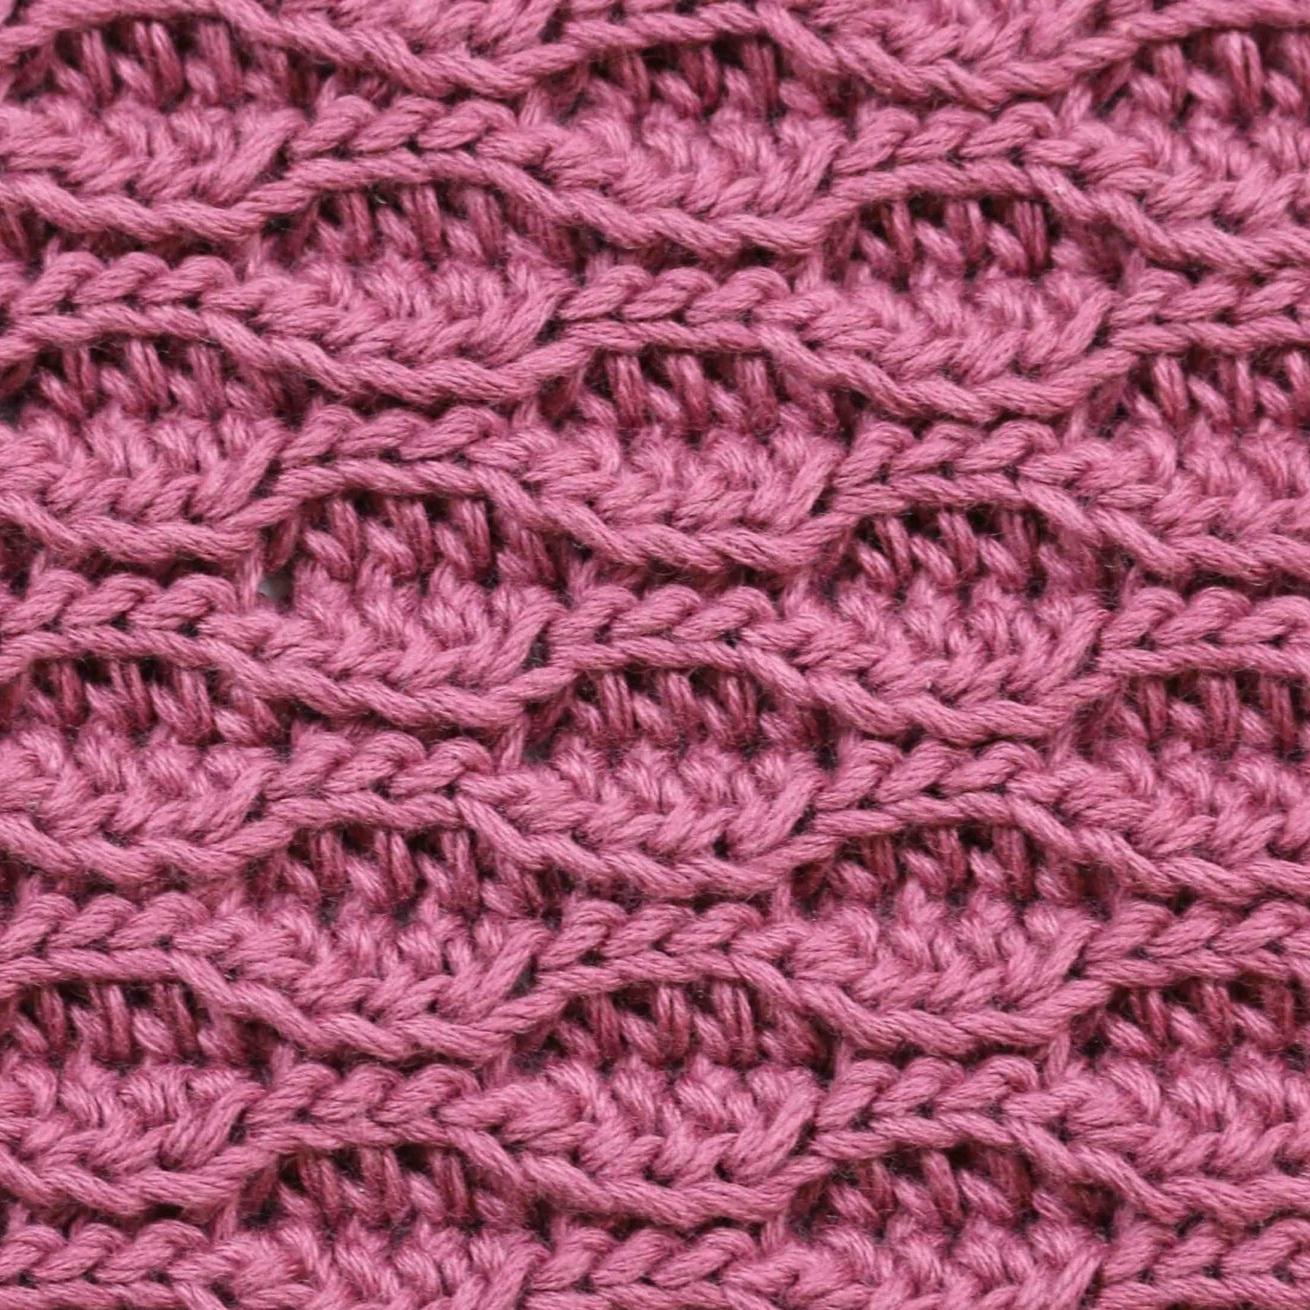 almond stitch crochet free pattern punto almendra patron gratis ganchillo